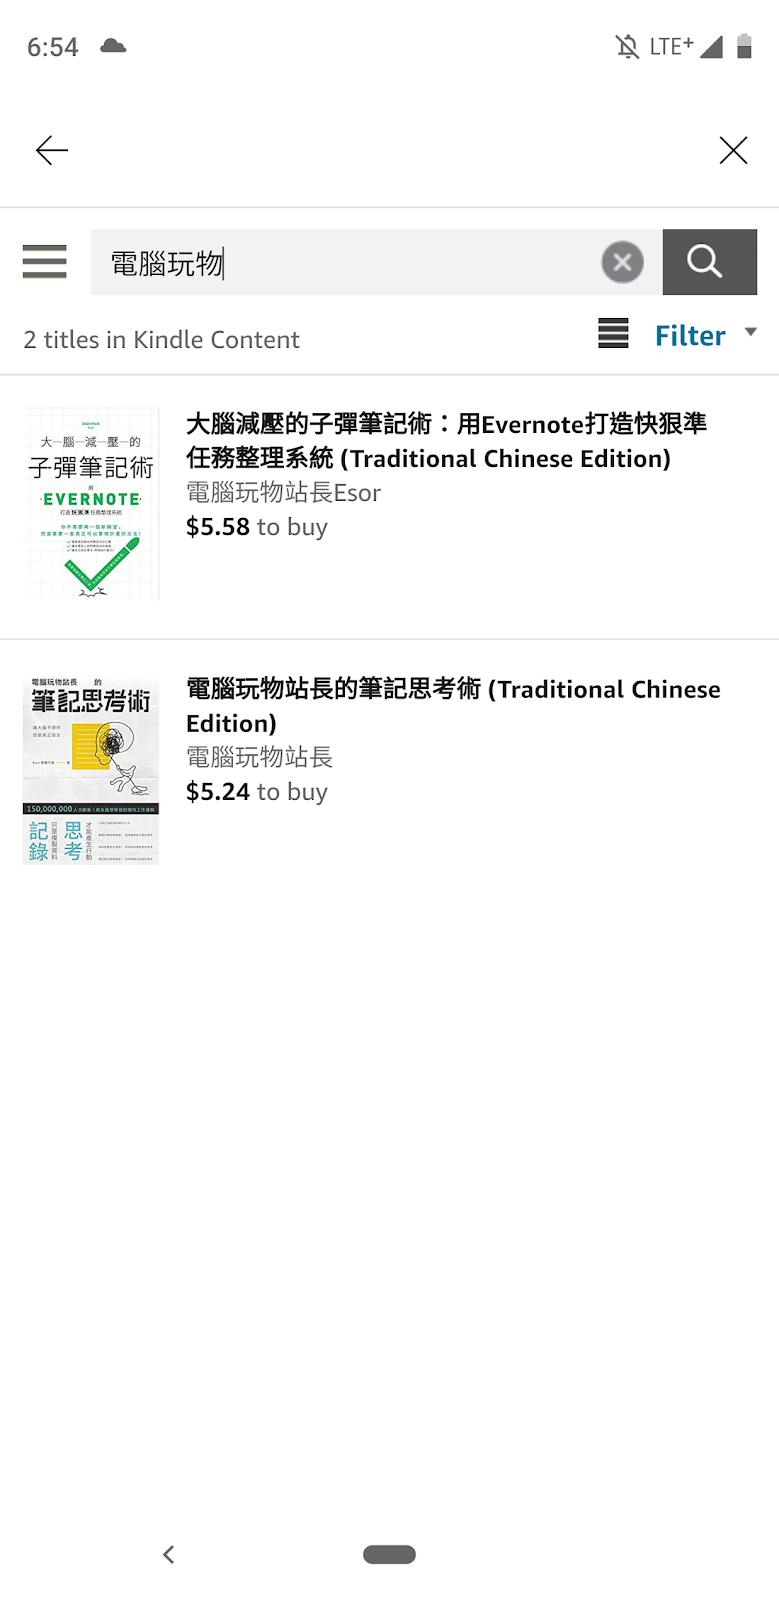 Amazon Kindle 繁體中文電子書的購買,筆記與匯出書摘教學